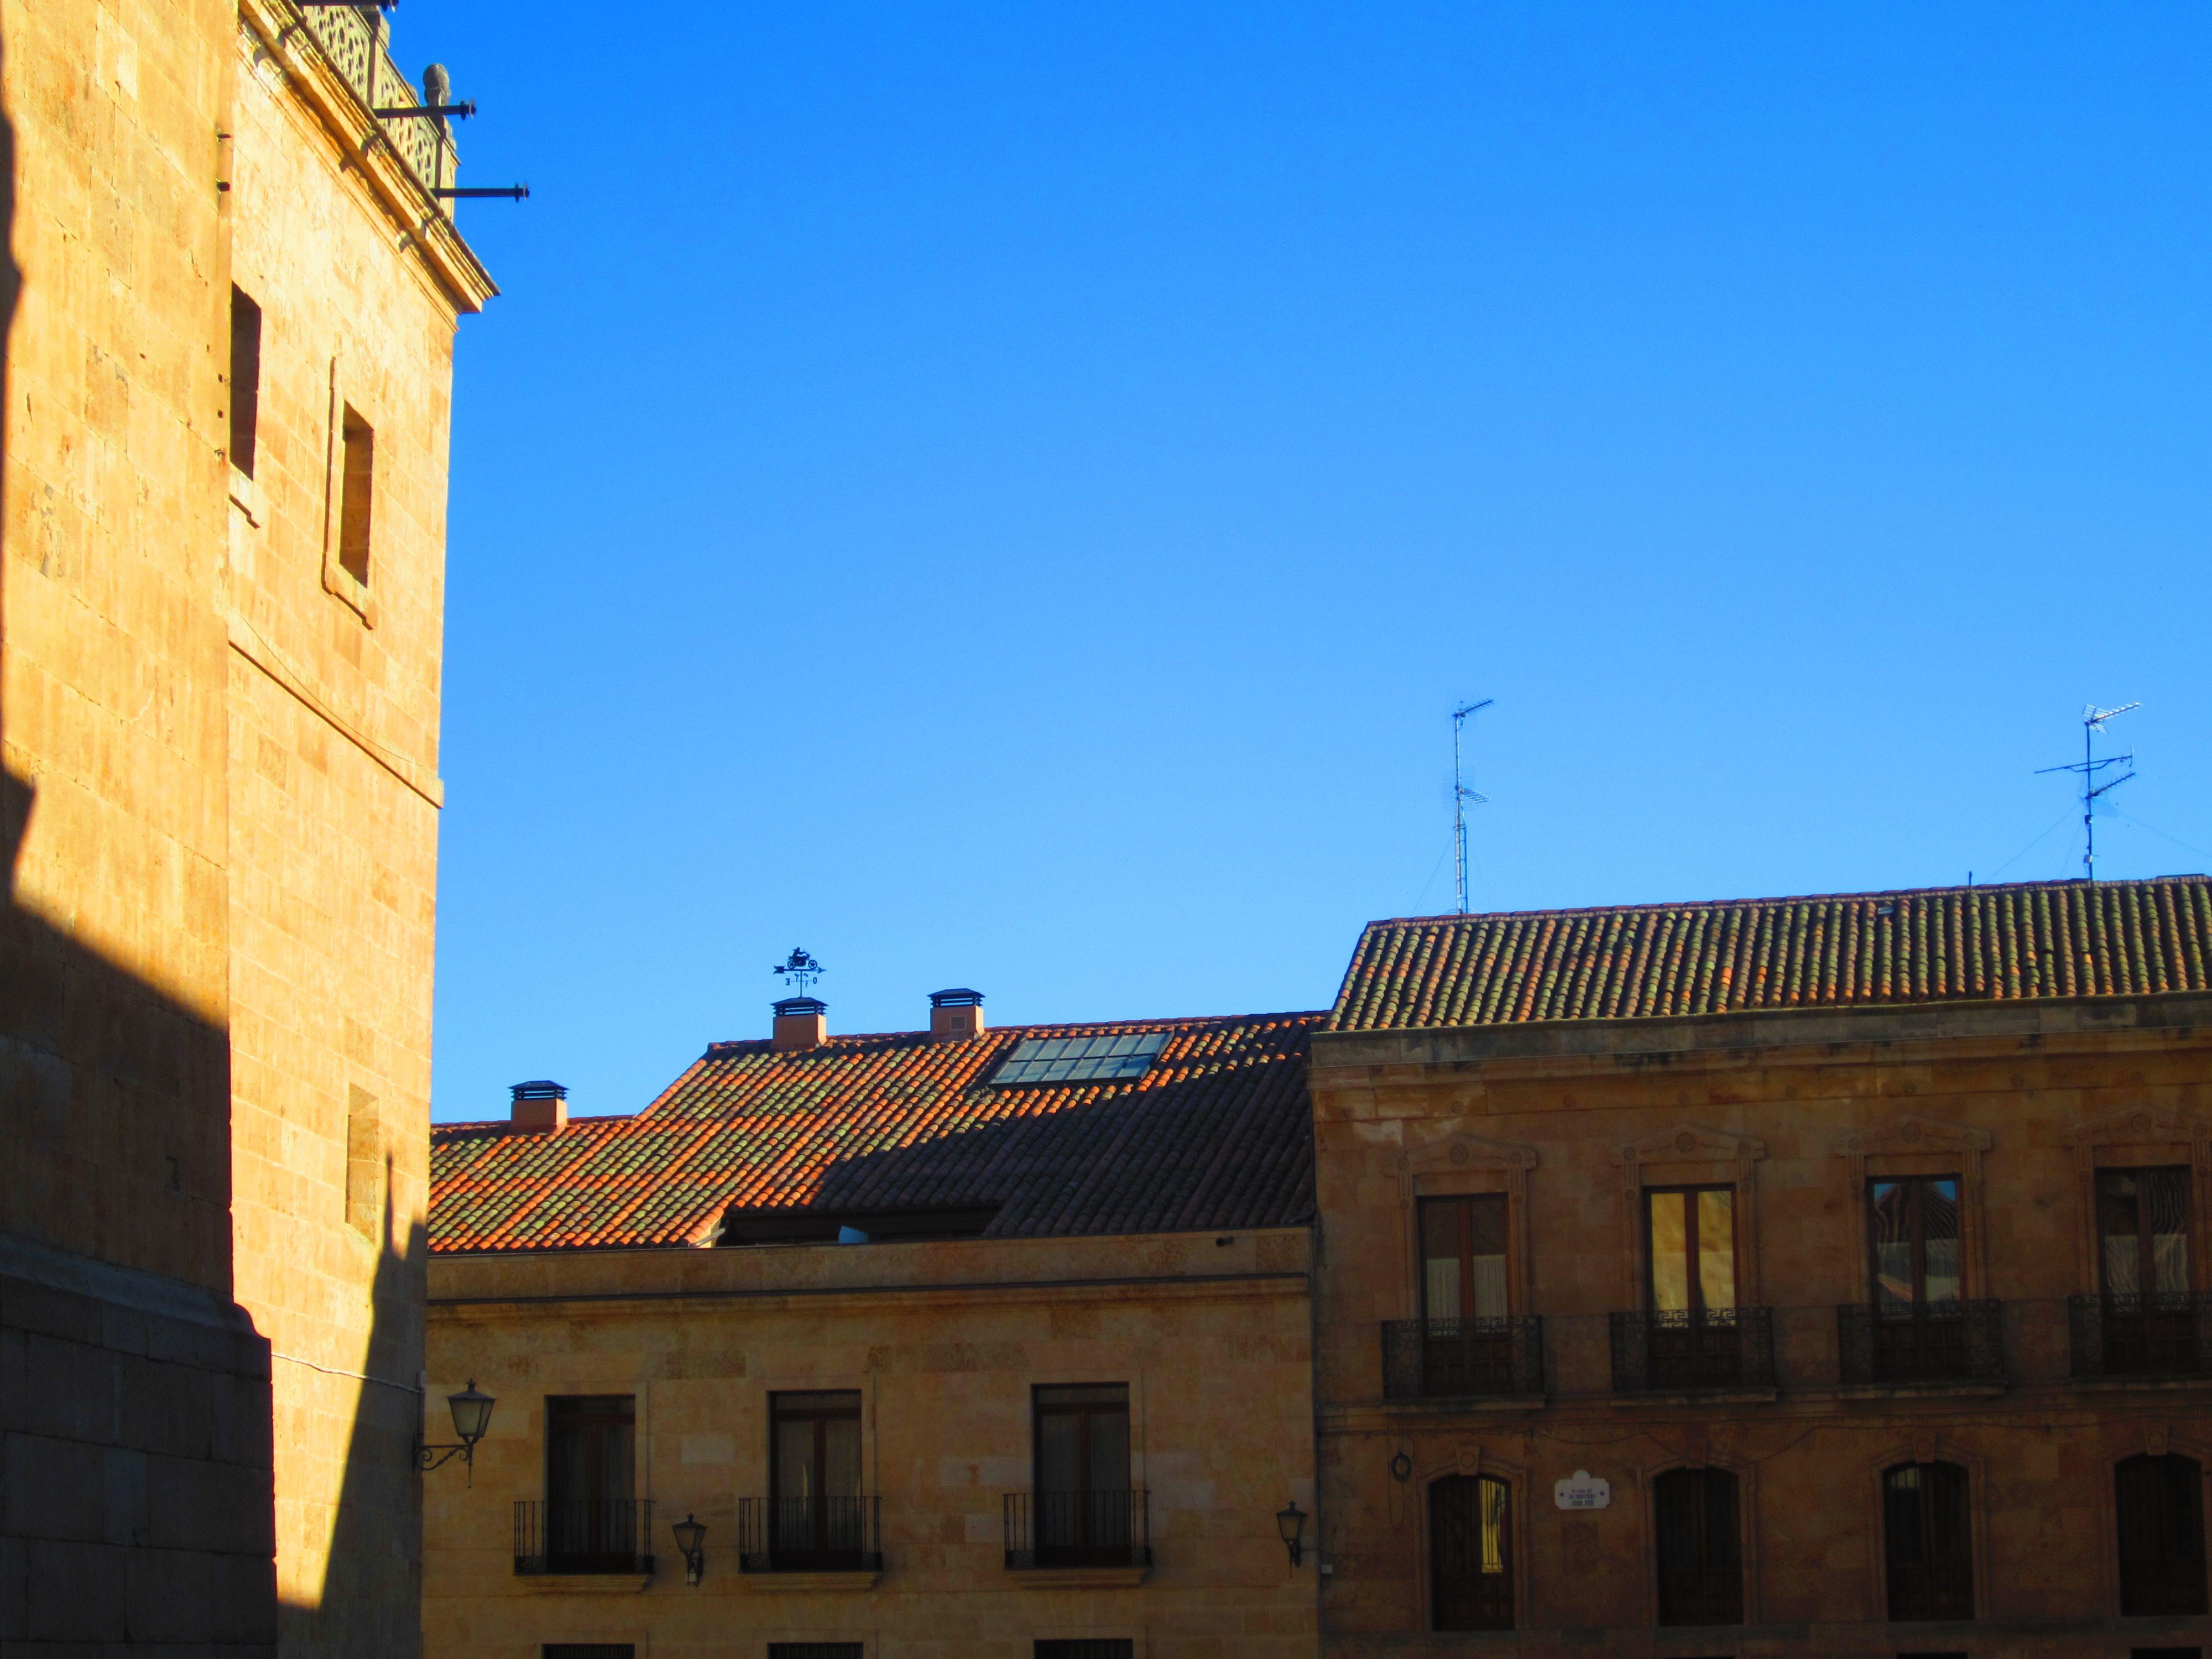 My favorite corner of Salamanca, Spain  Complete with plenty of birds and street musicians